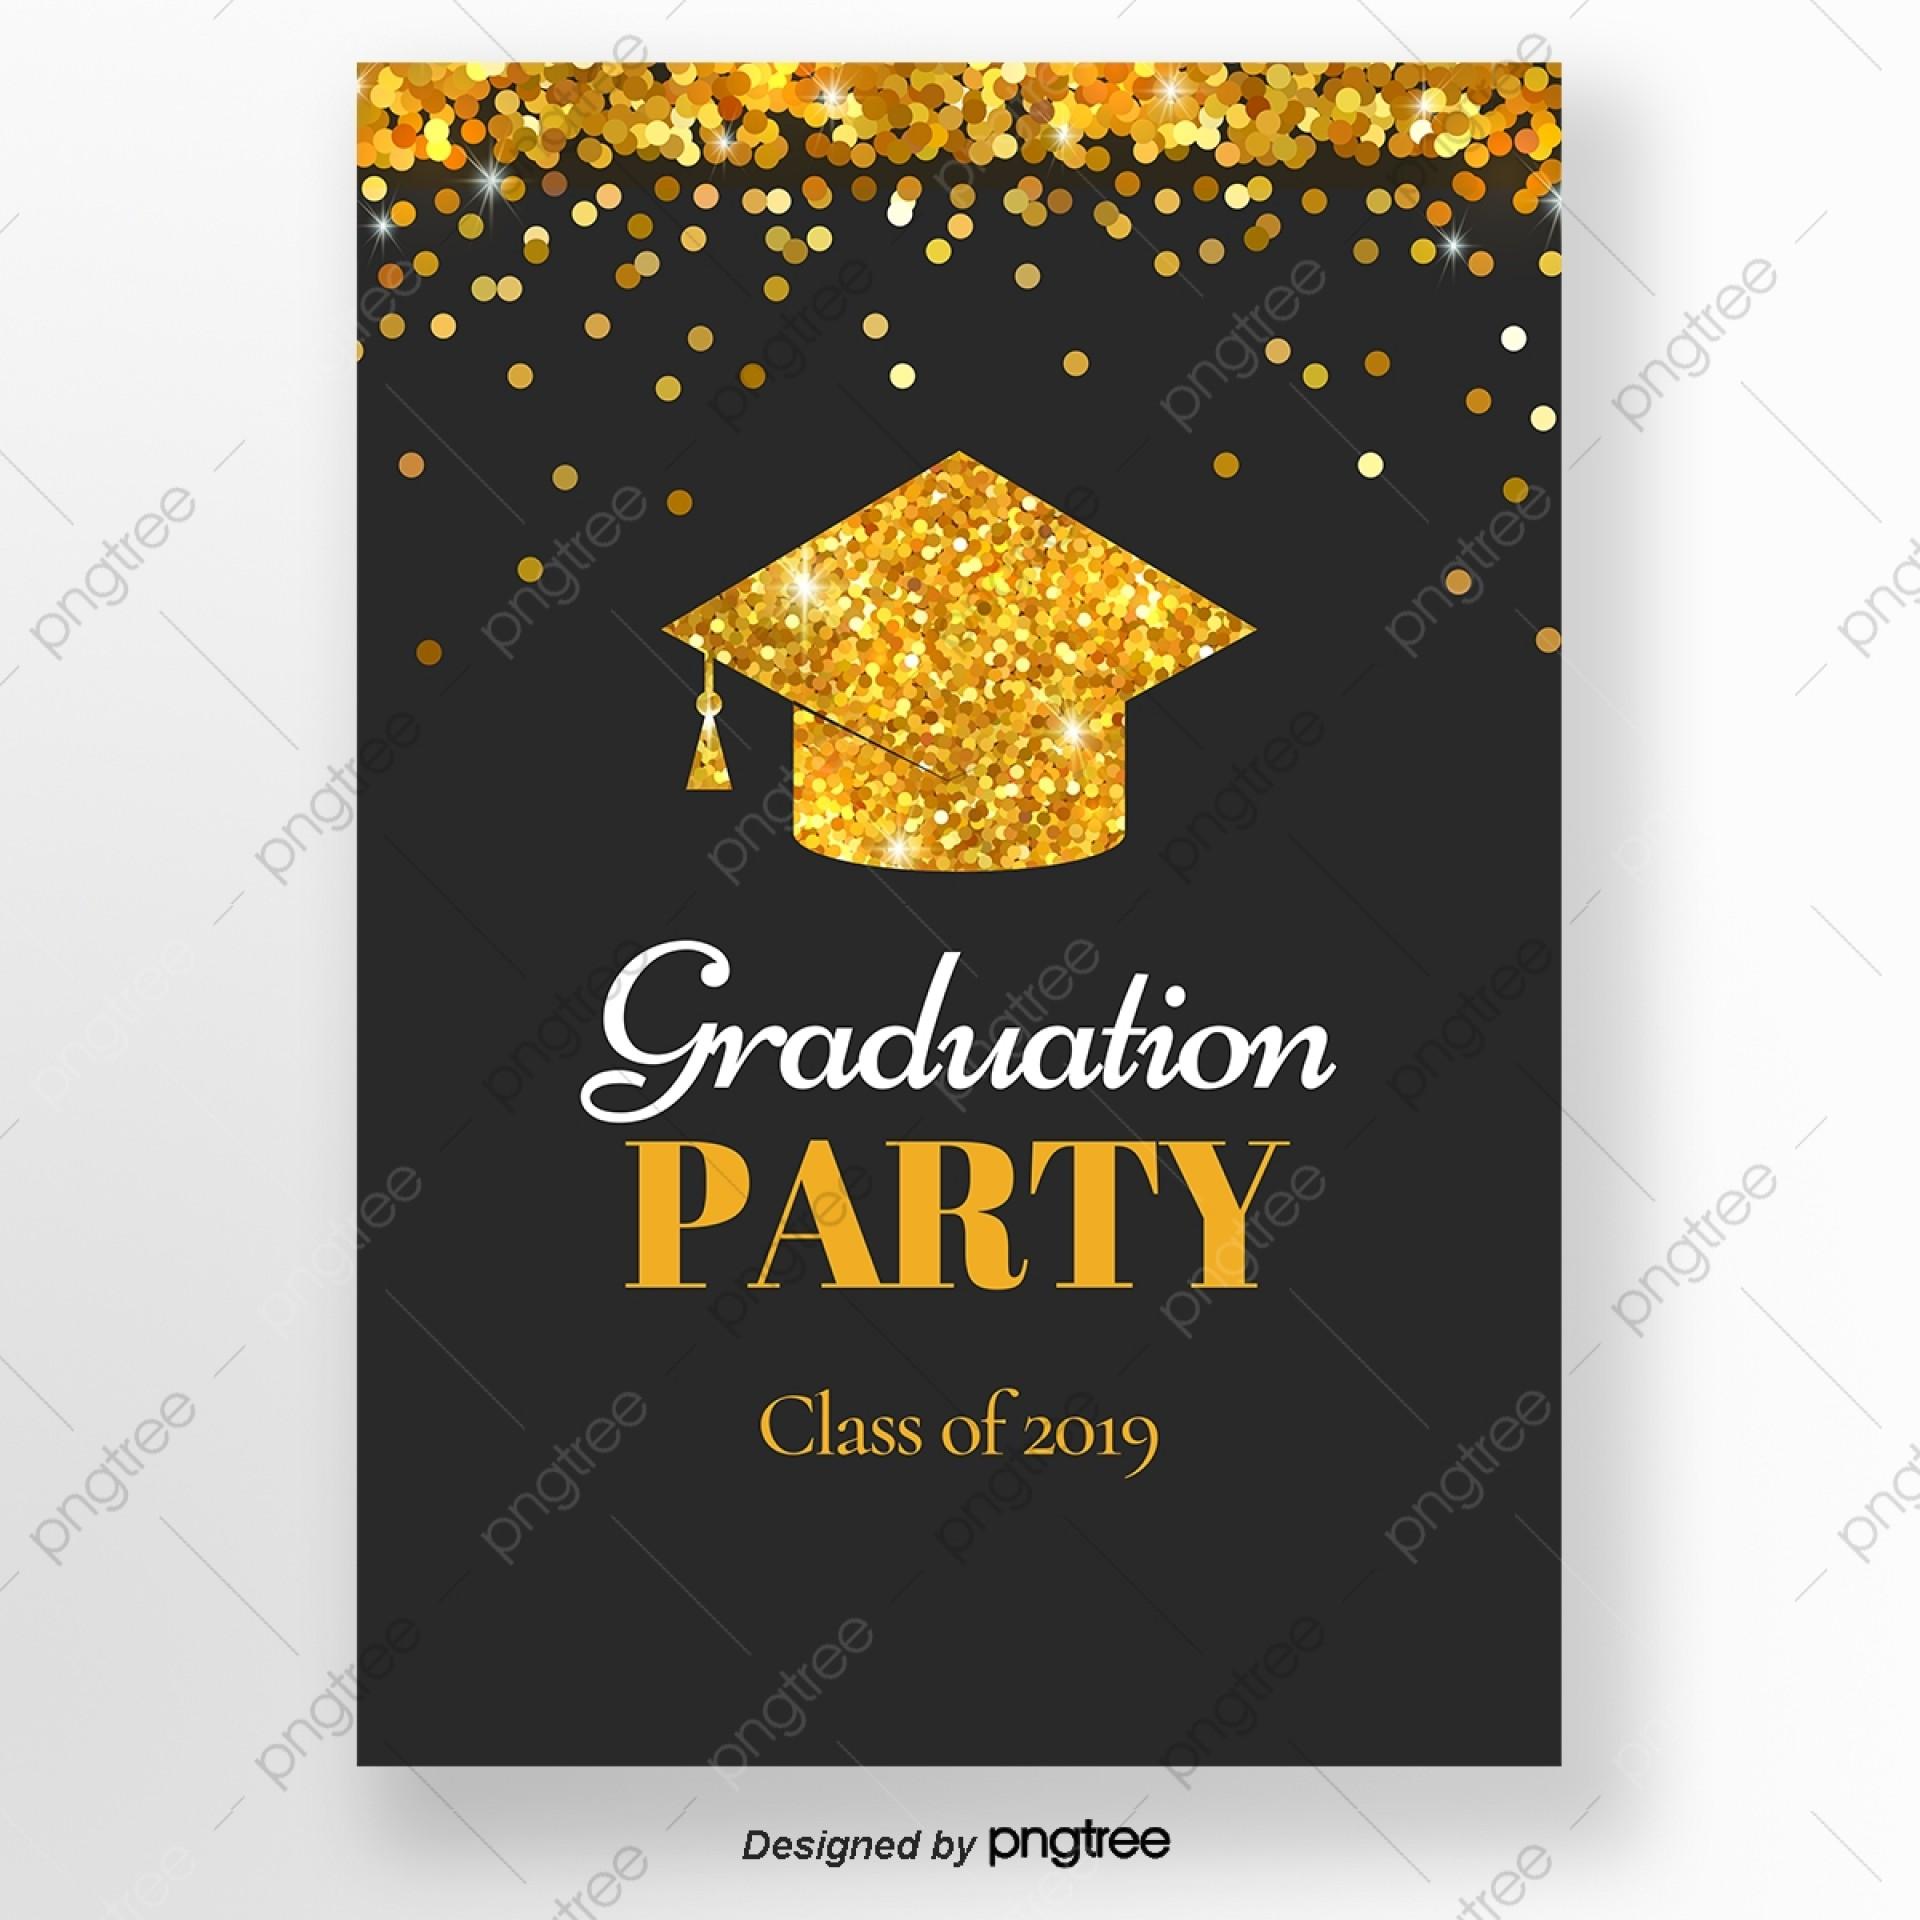 010 Unusual Graduation Party Invitation Template Photo  Microsoft Word 4 Per Page1920